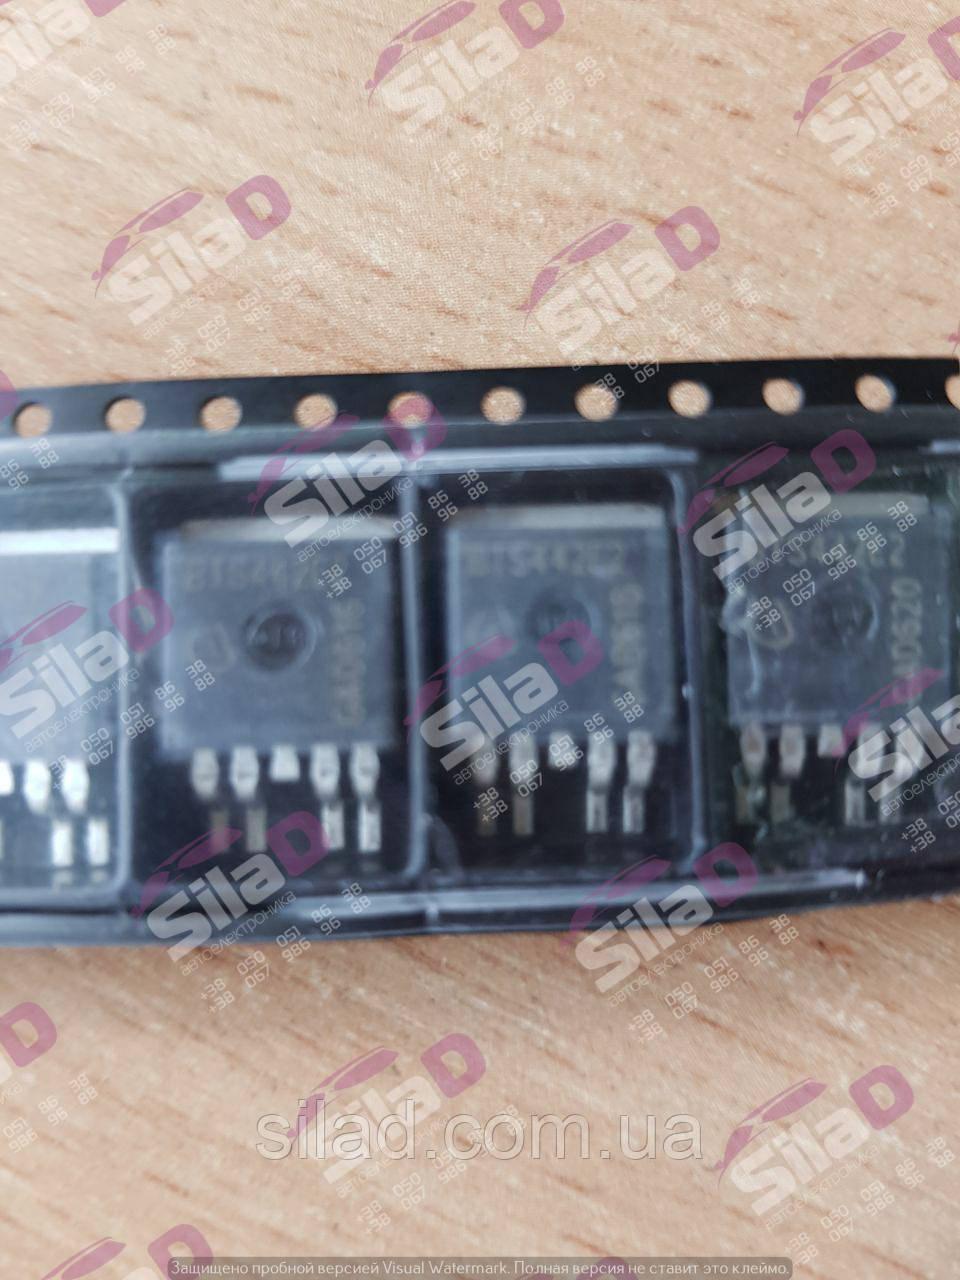 Транзистор BTS442E2 BTS442 E2 BTS442 корпус PG-TO263-5-2